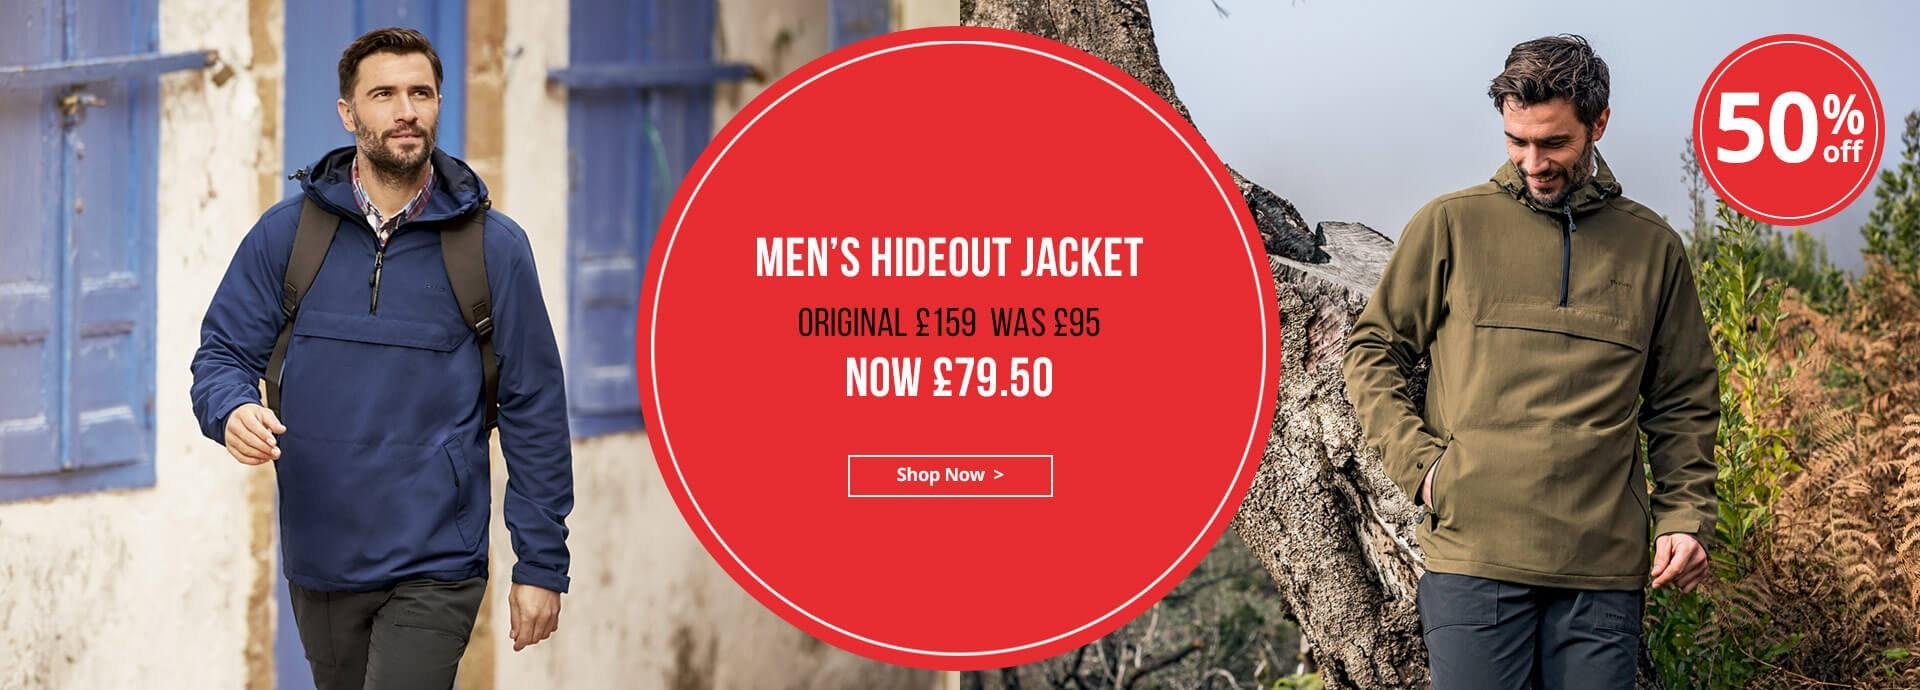 Men's Hideout Jacket